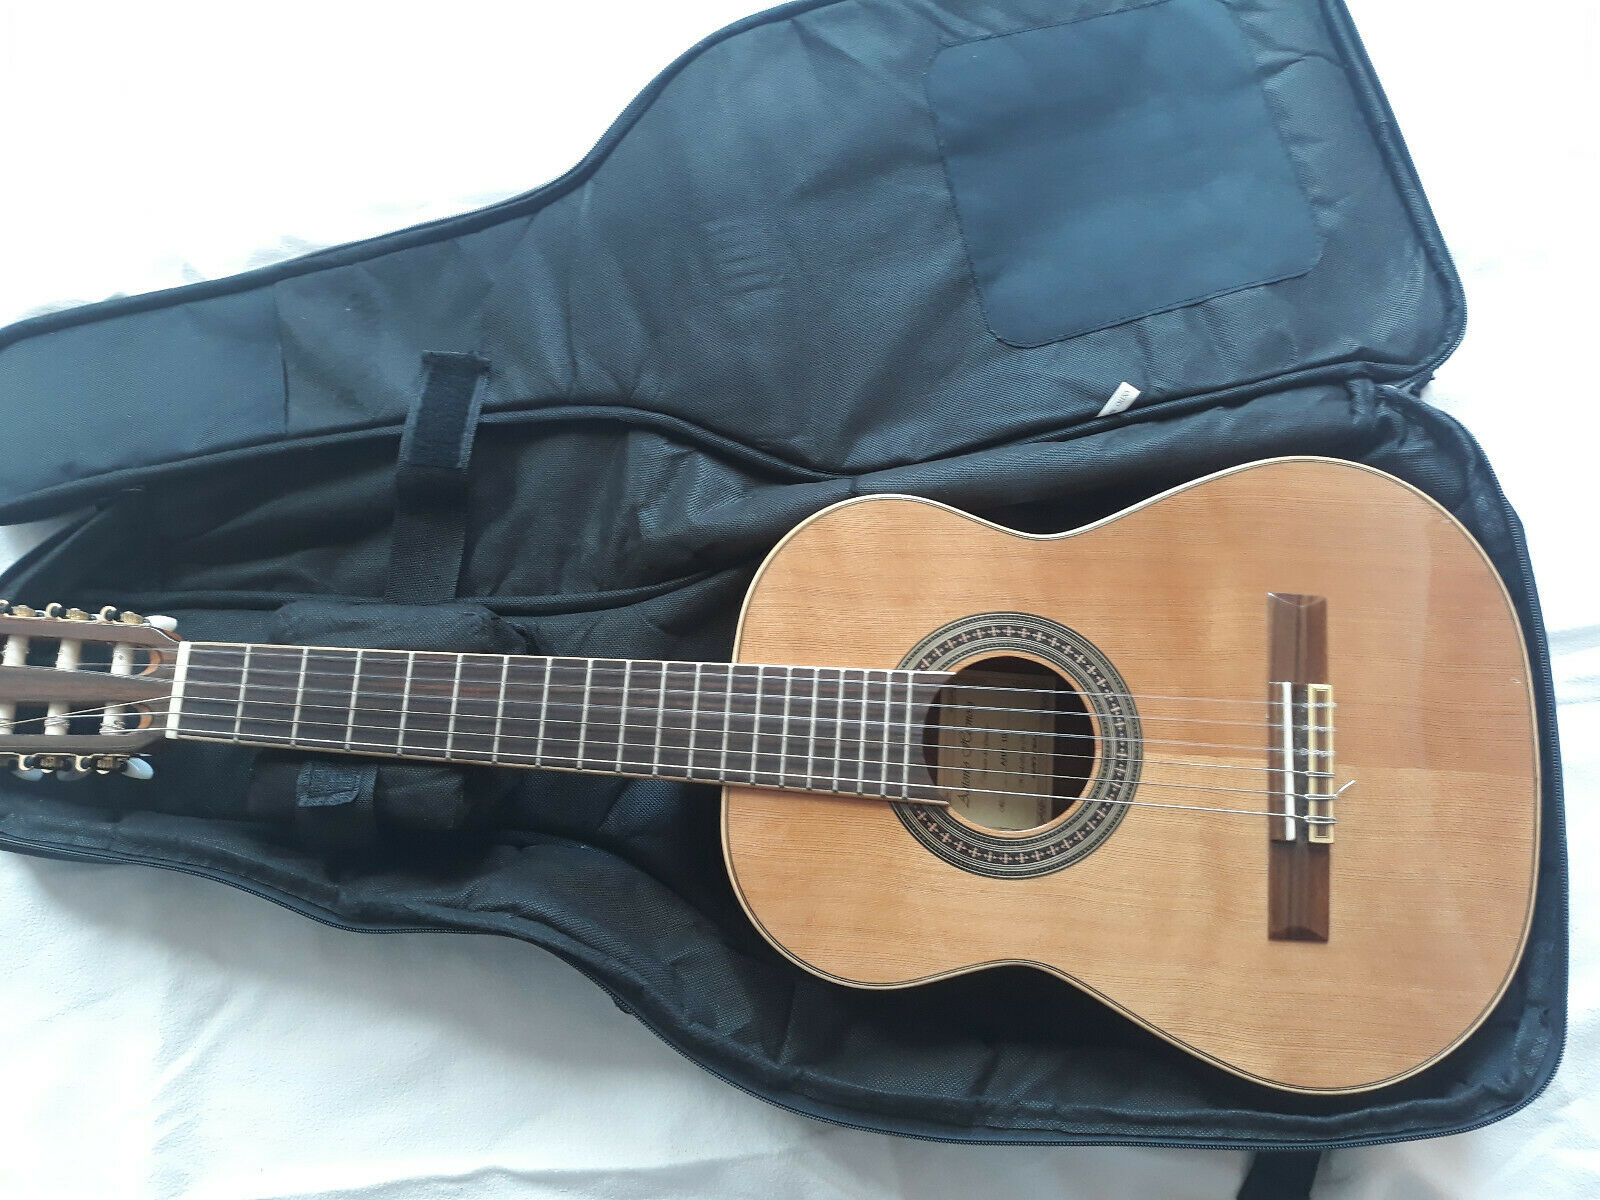 Gitarre 1 2 Antonio Hermosa AHH-100